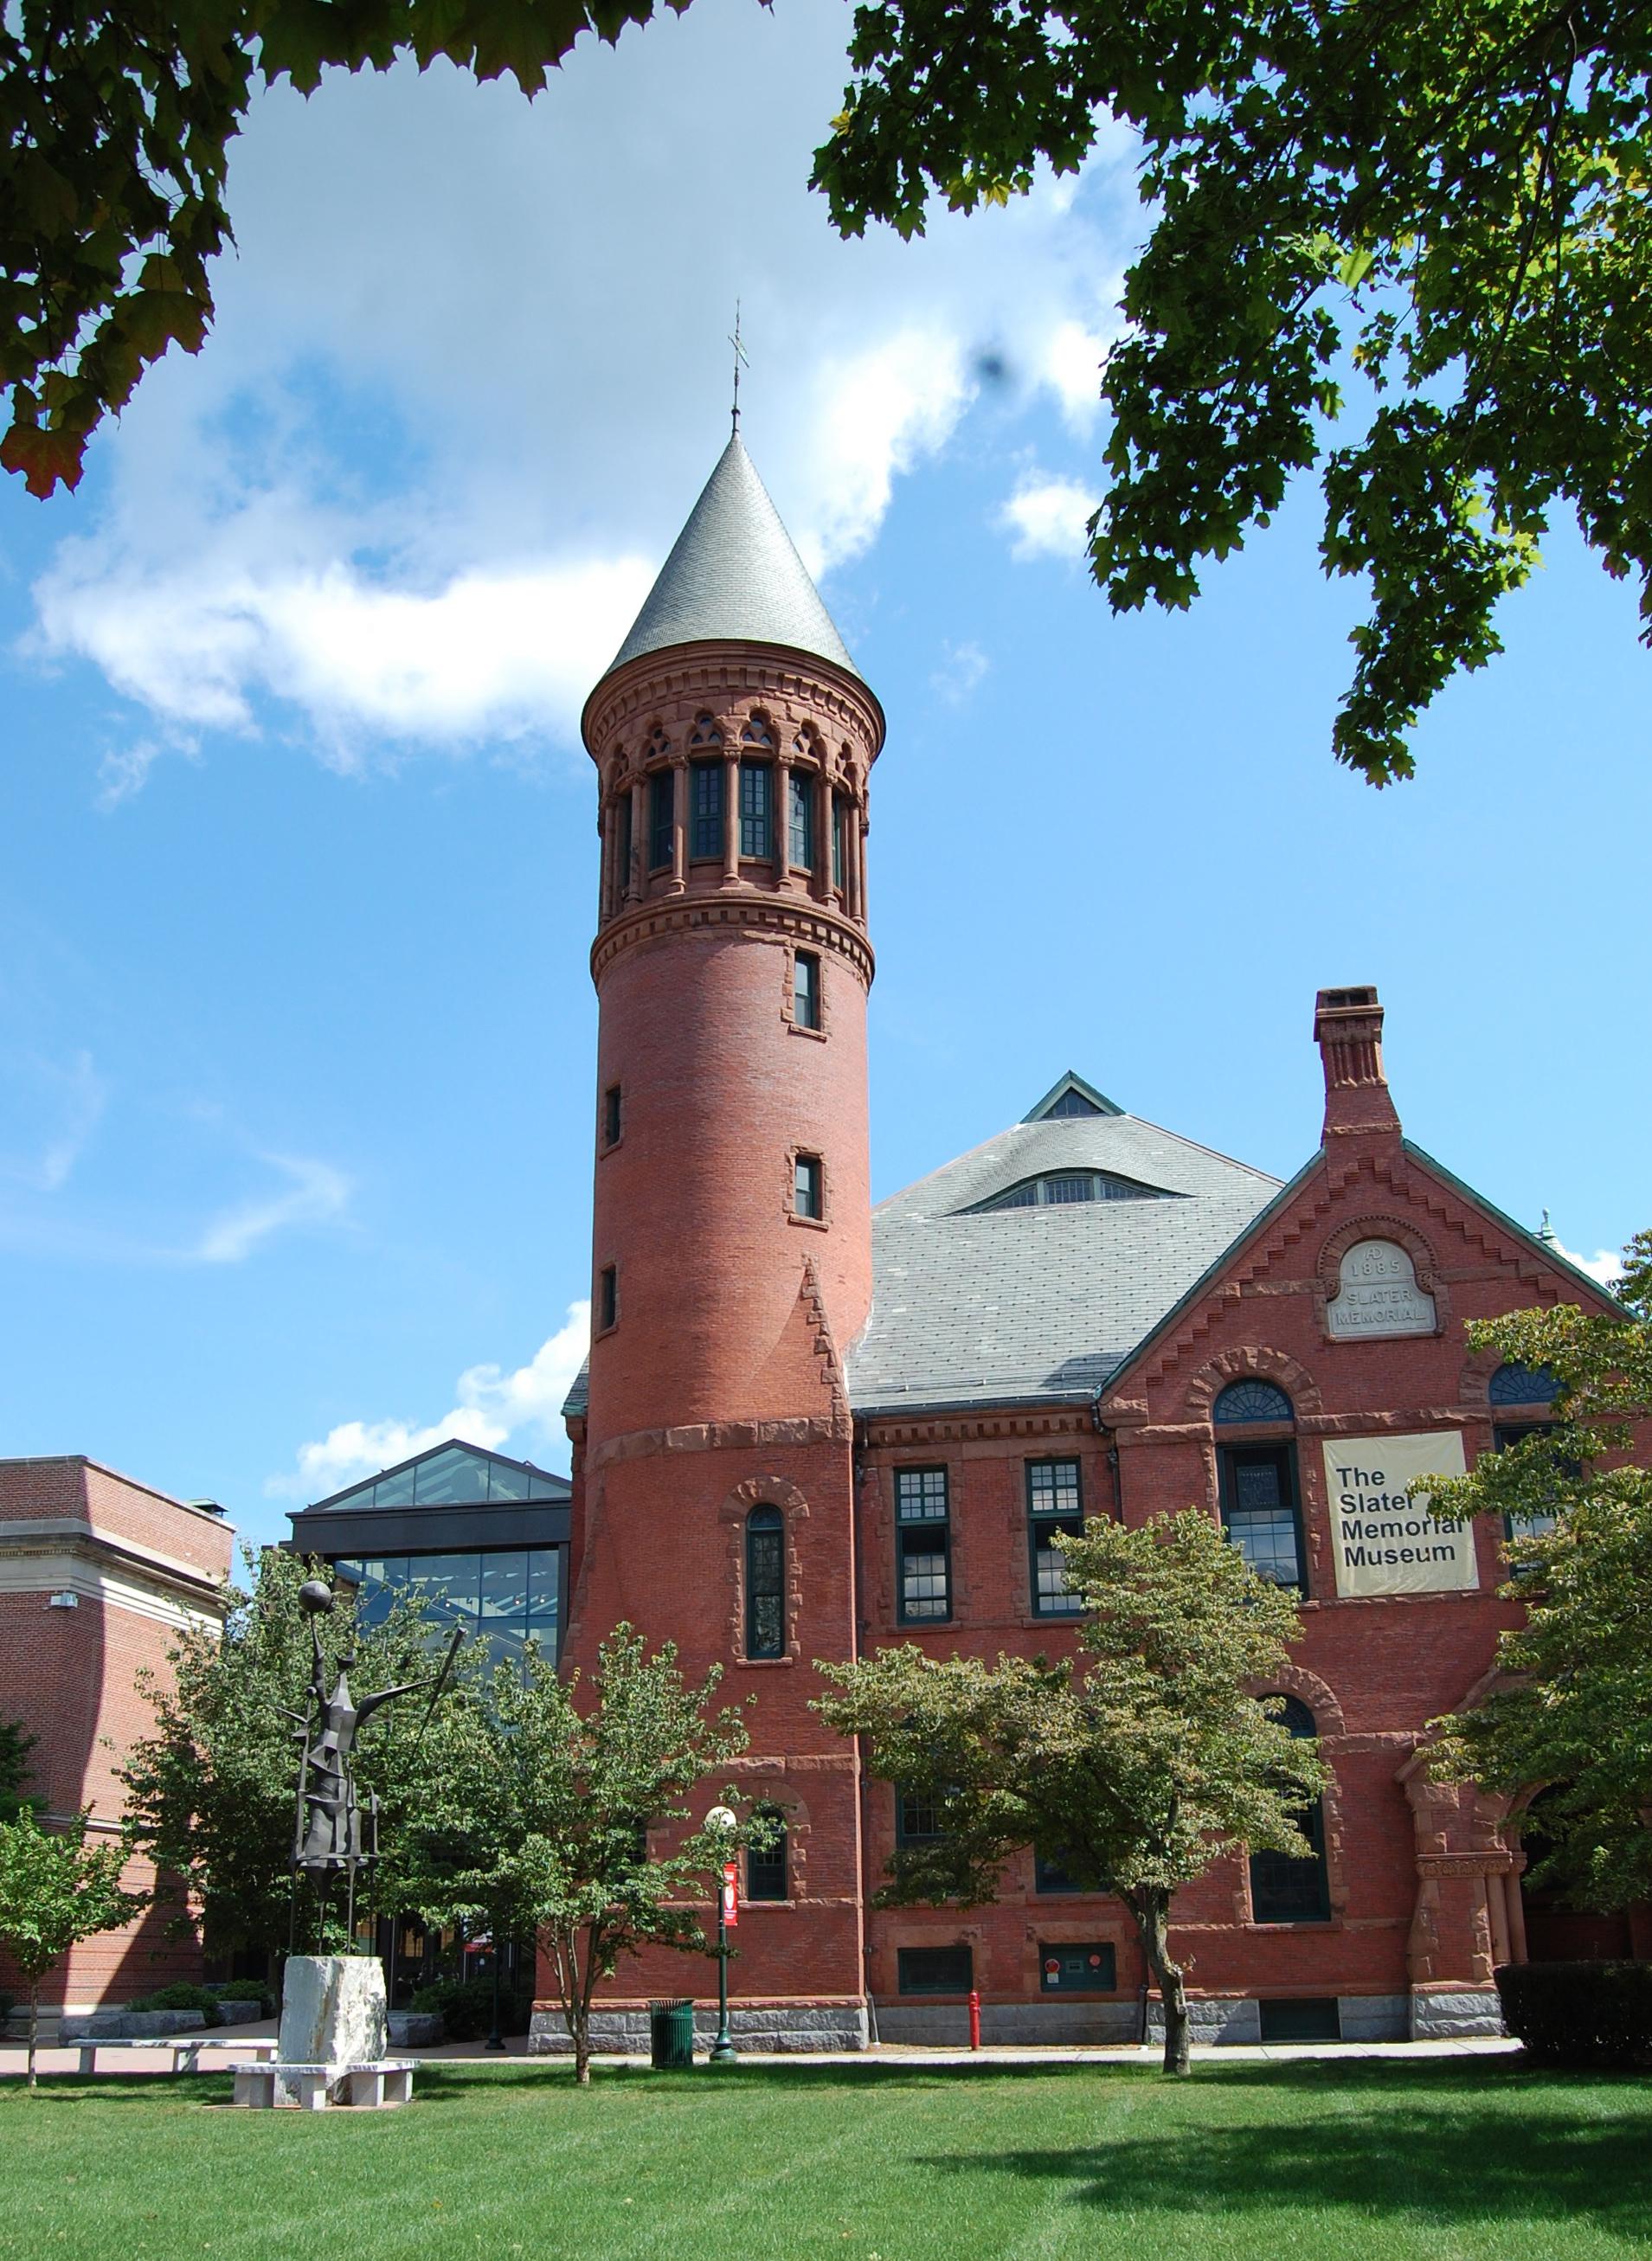 The Slater Memorial Museum copy